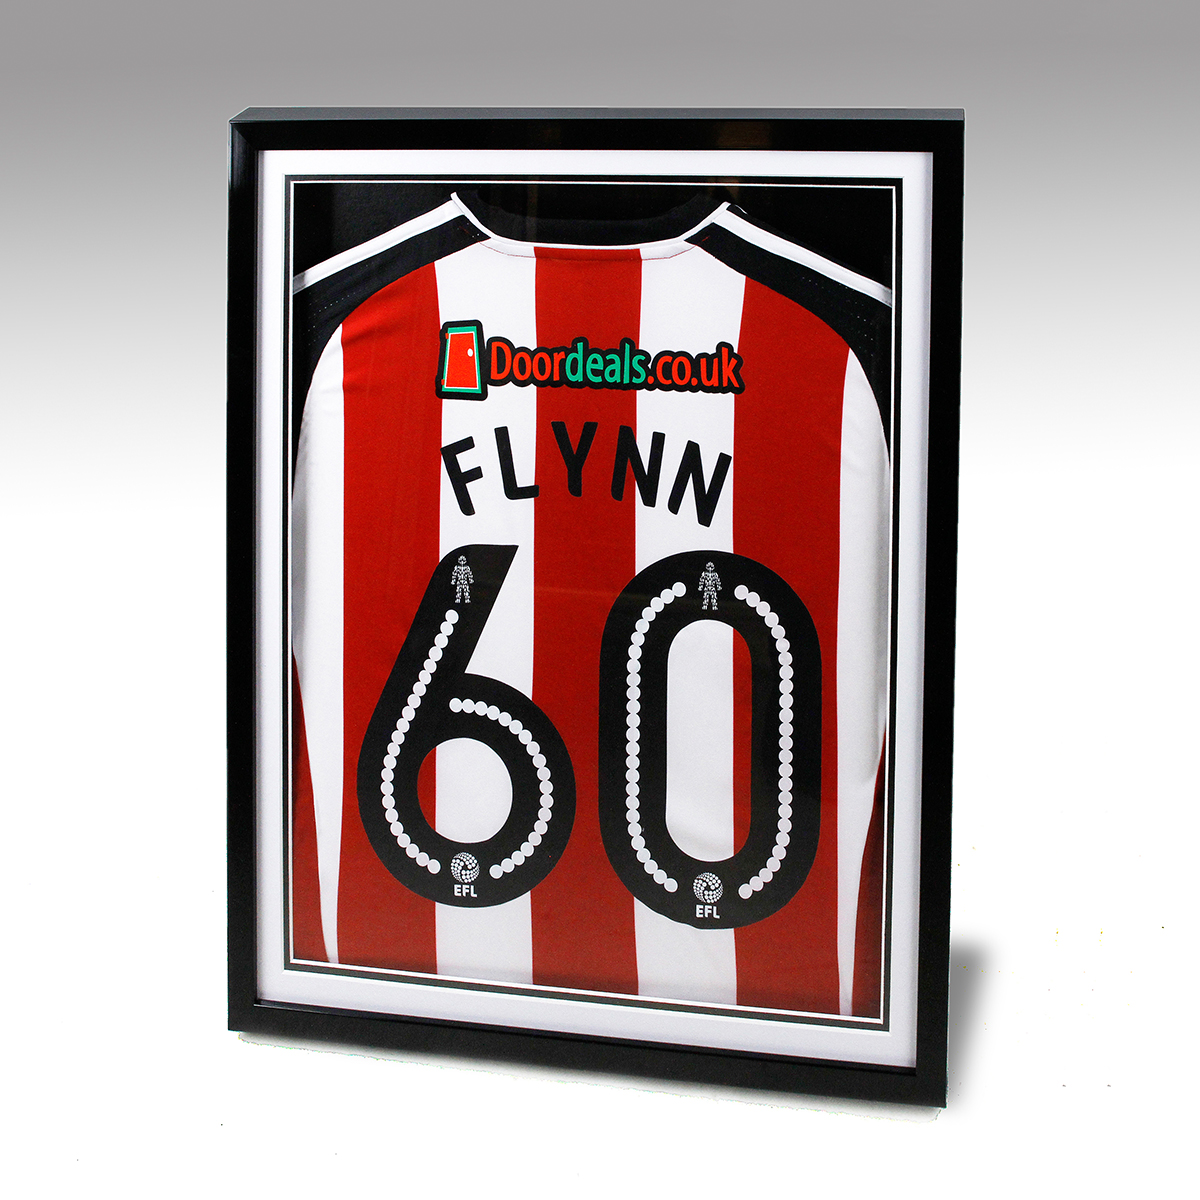 PhotoWizards-web-1200x1200-Sheffield-United-Framed-Shirt-03.jpg